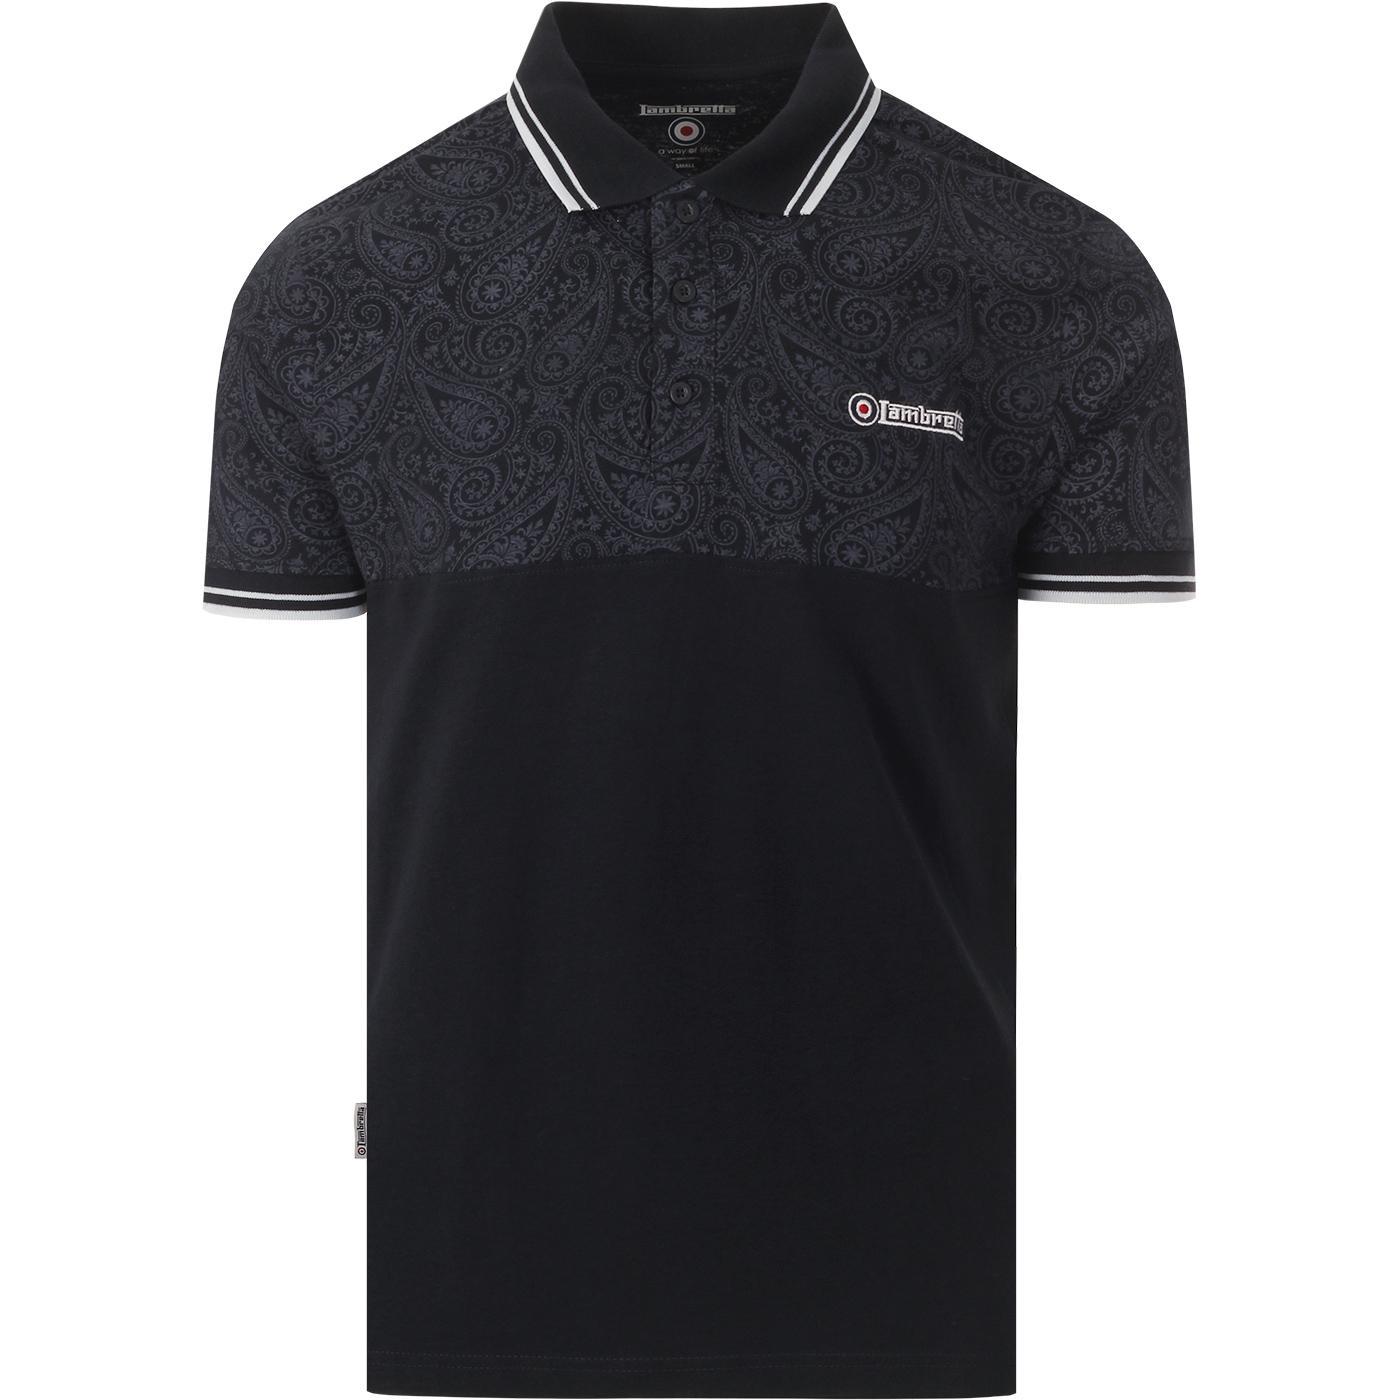 LAMBRETTA Retro Mod Paisley Panel Polo Shirt NAVY